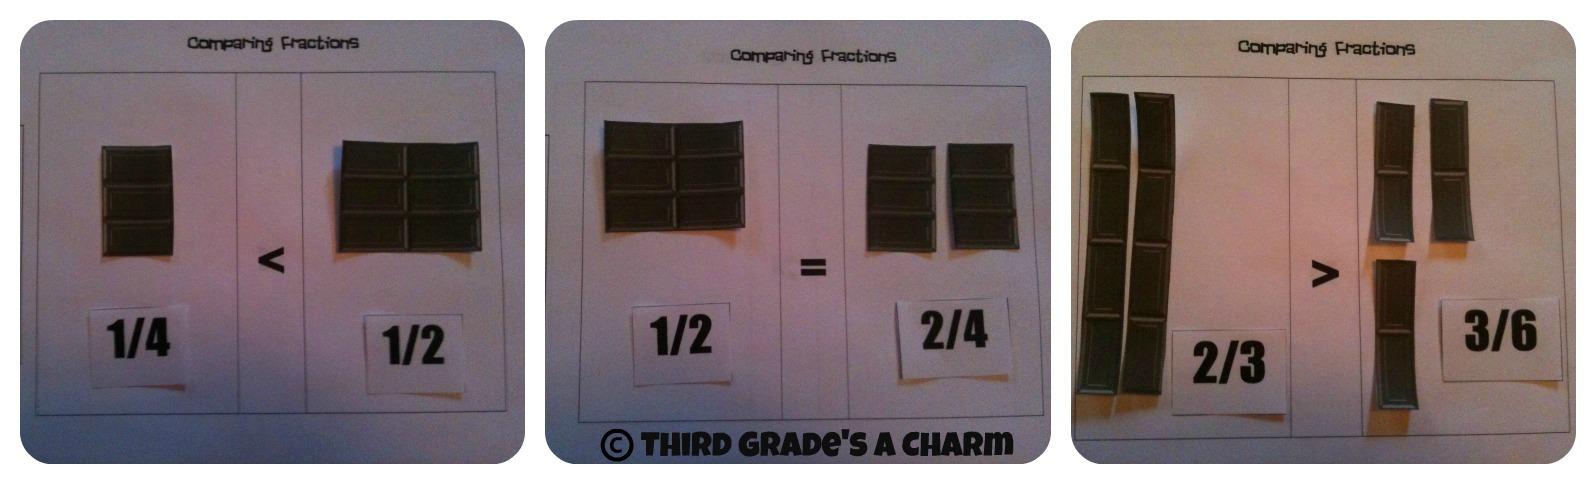 3rd Grades A Charm Hershey BarsYes Please – Hershey Bar Fraction Worksheet